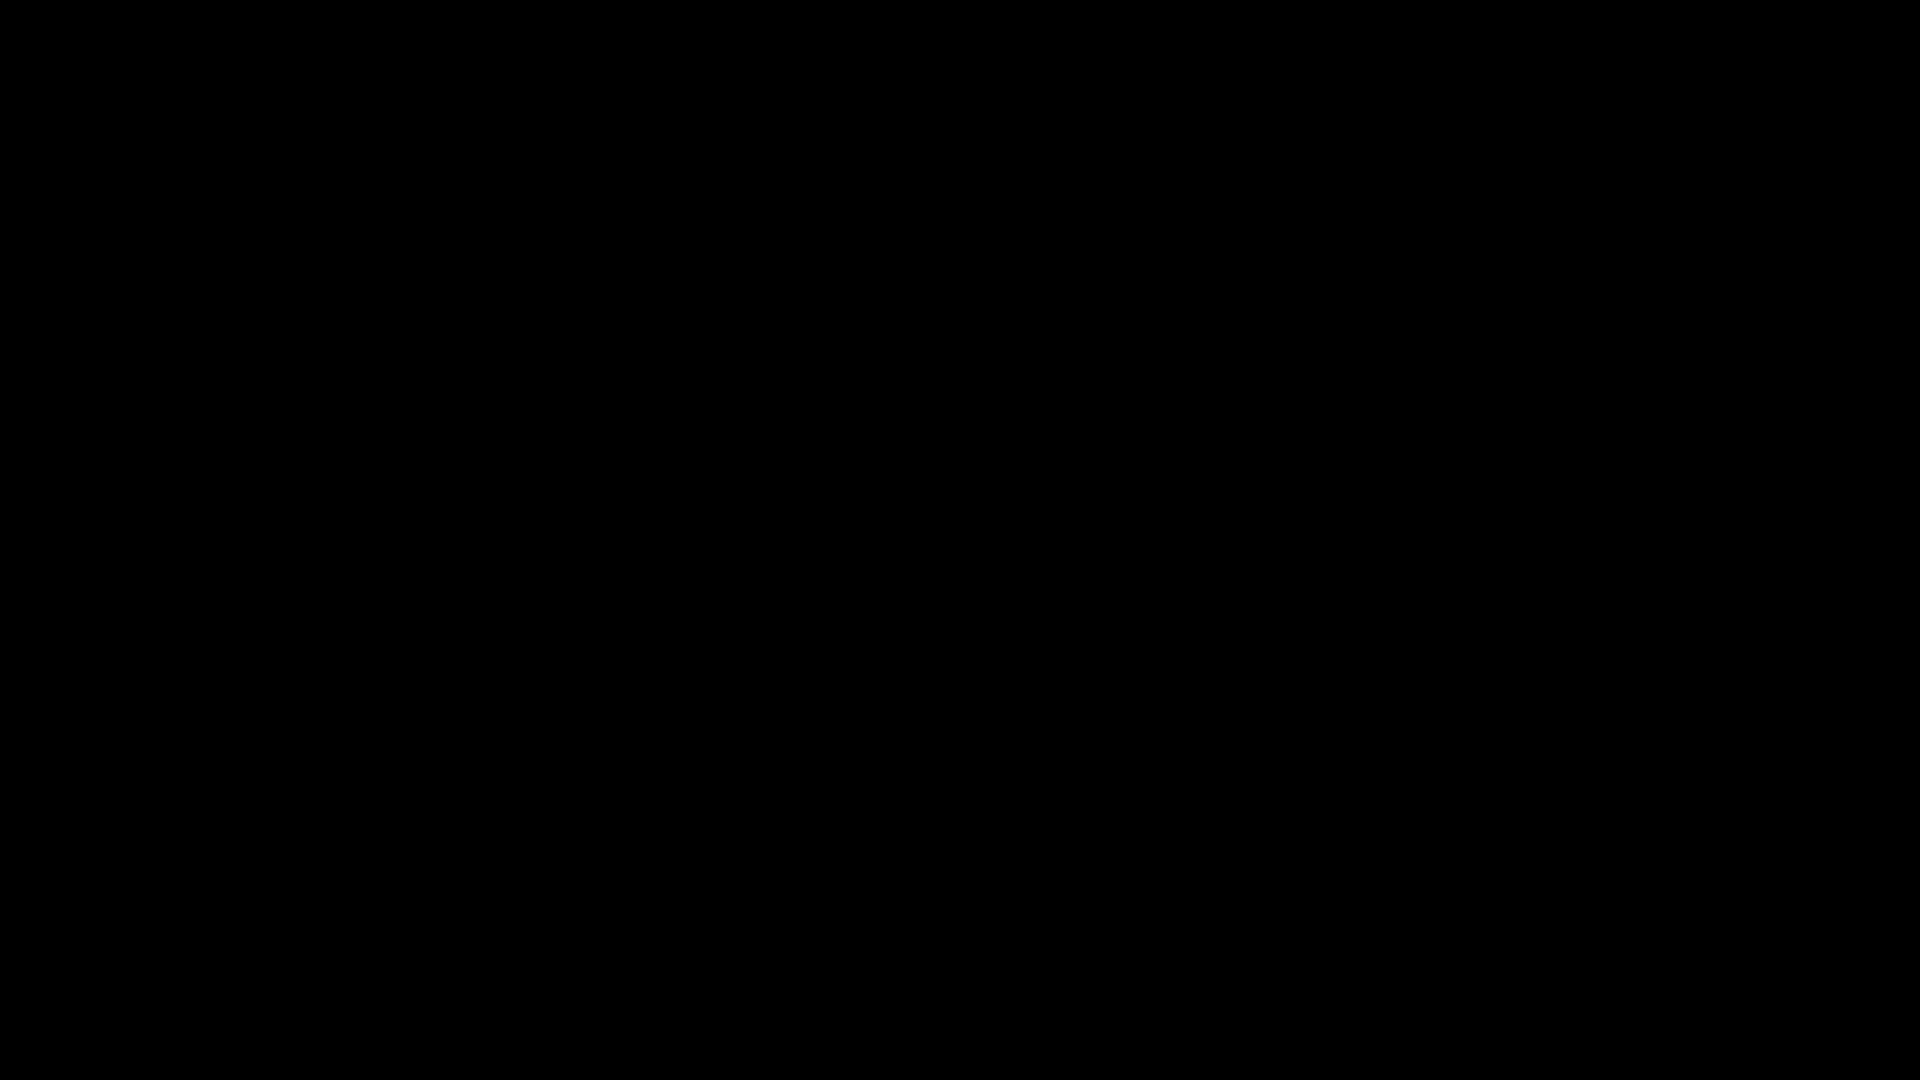 common, Common 06.09.2018 - 03.25.05.03.DVR GIFs